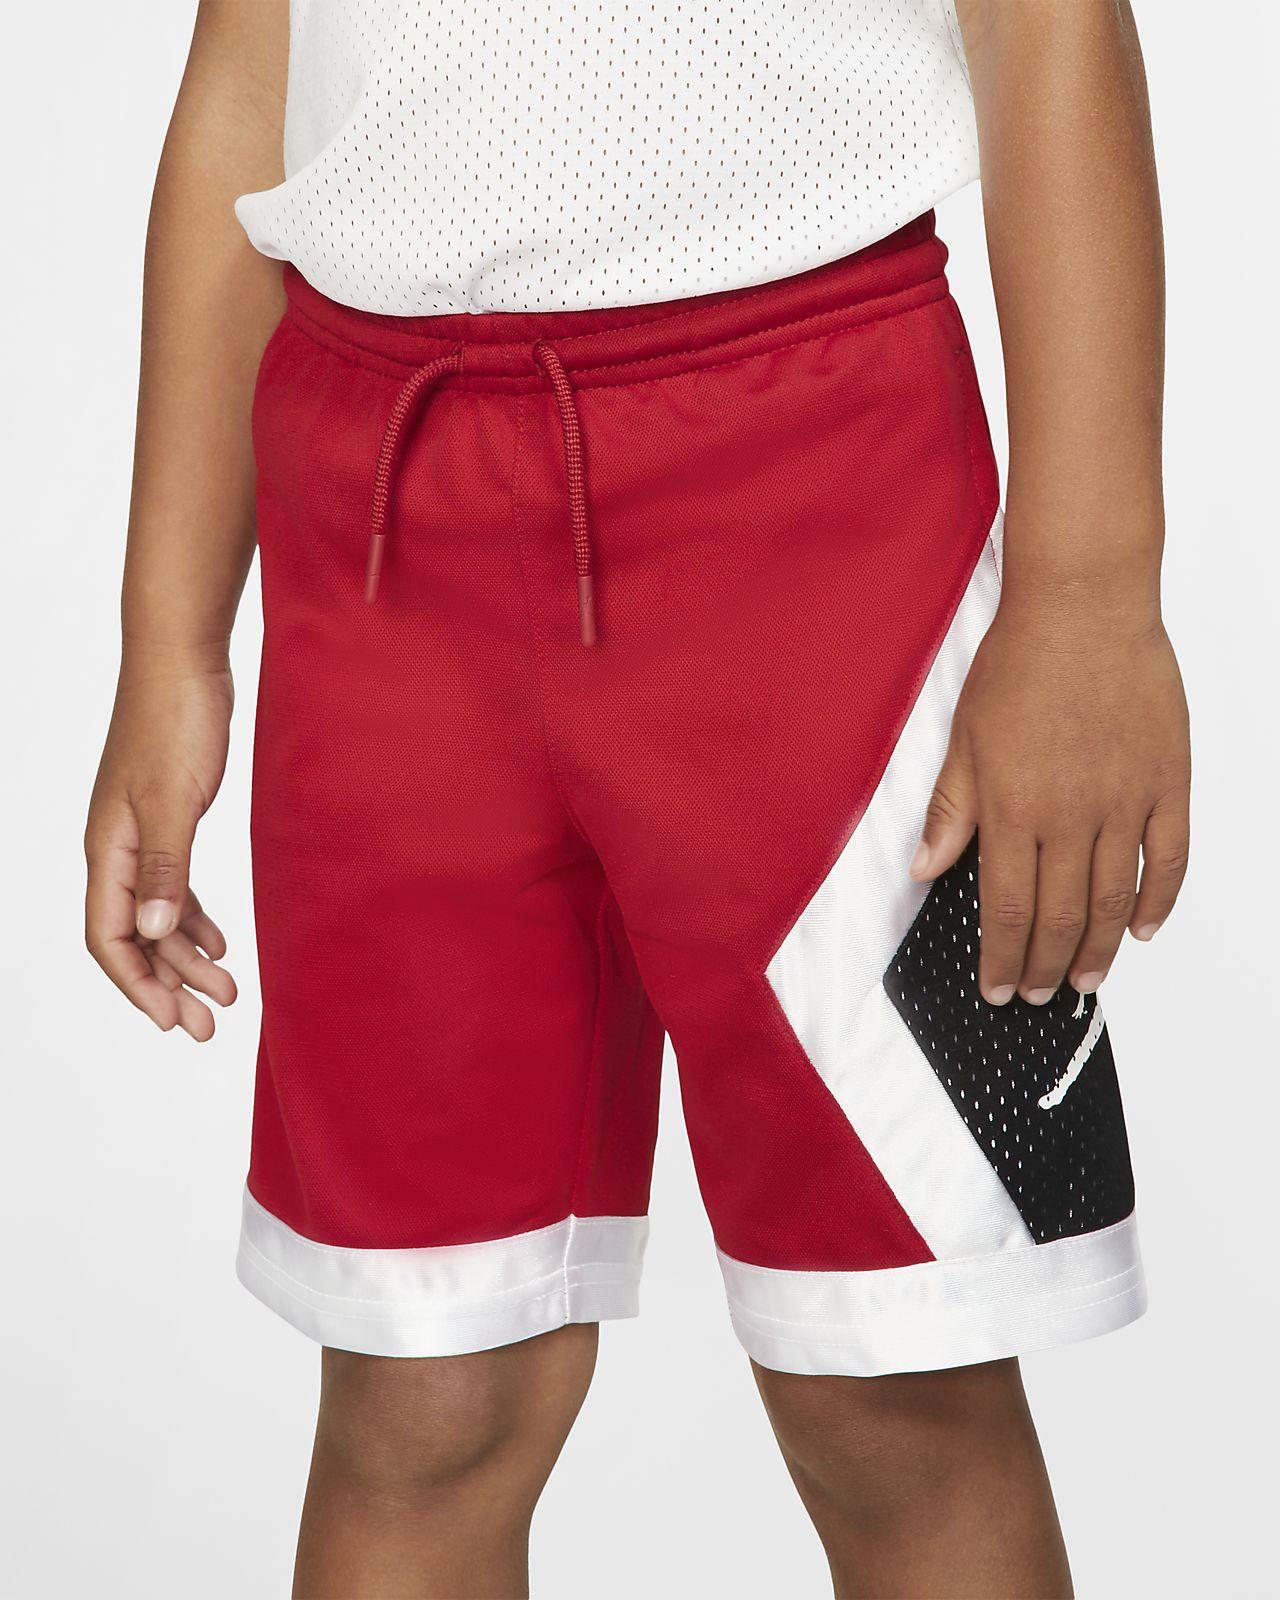 Jordan Dri-FIT Diamond Younger Kids' Shorts